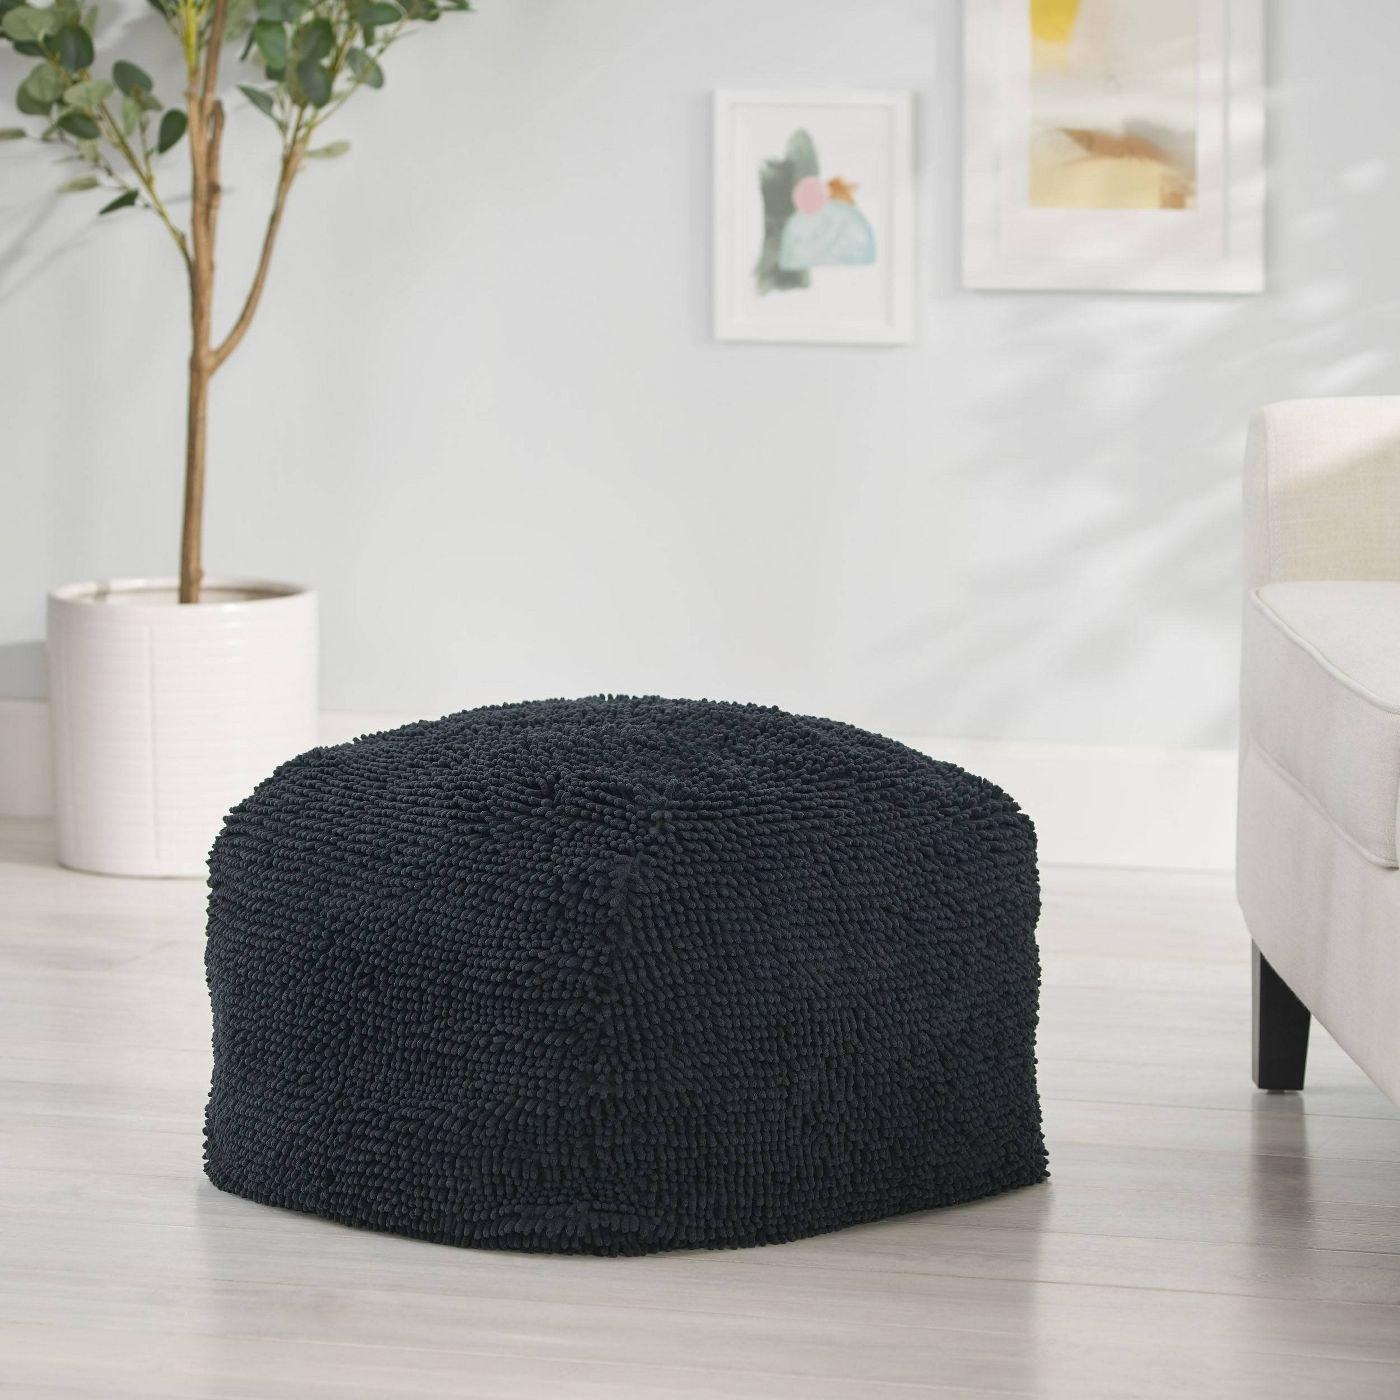 A black fuzzy ottoman in a home